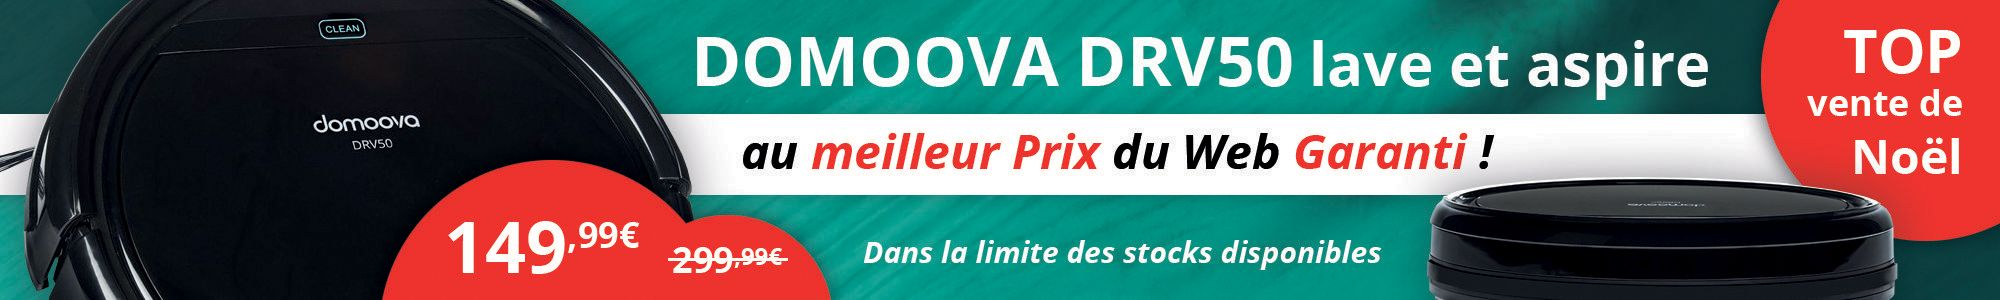 Domoova DRV50 au meilleur prix du web garanti !